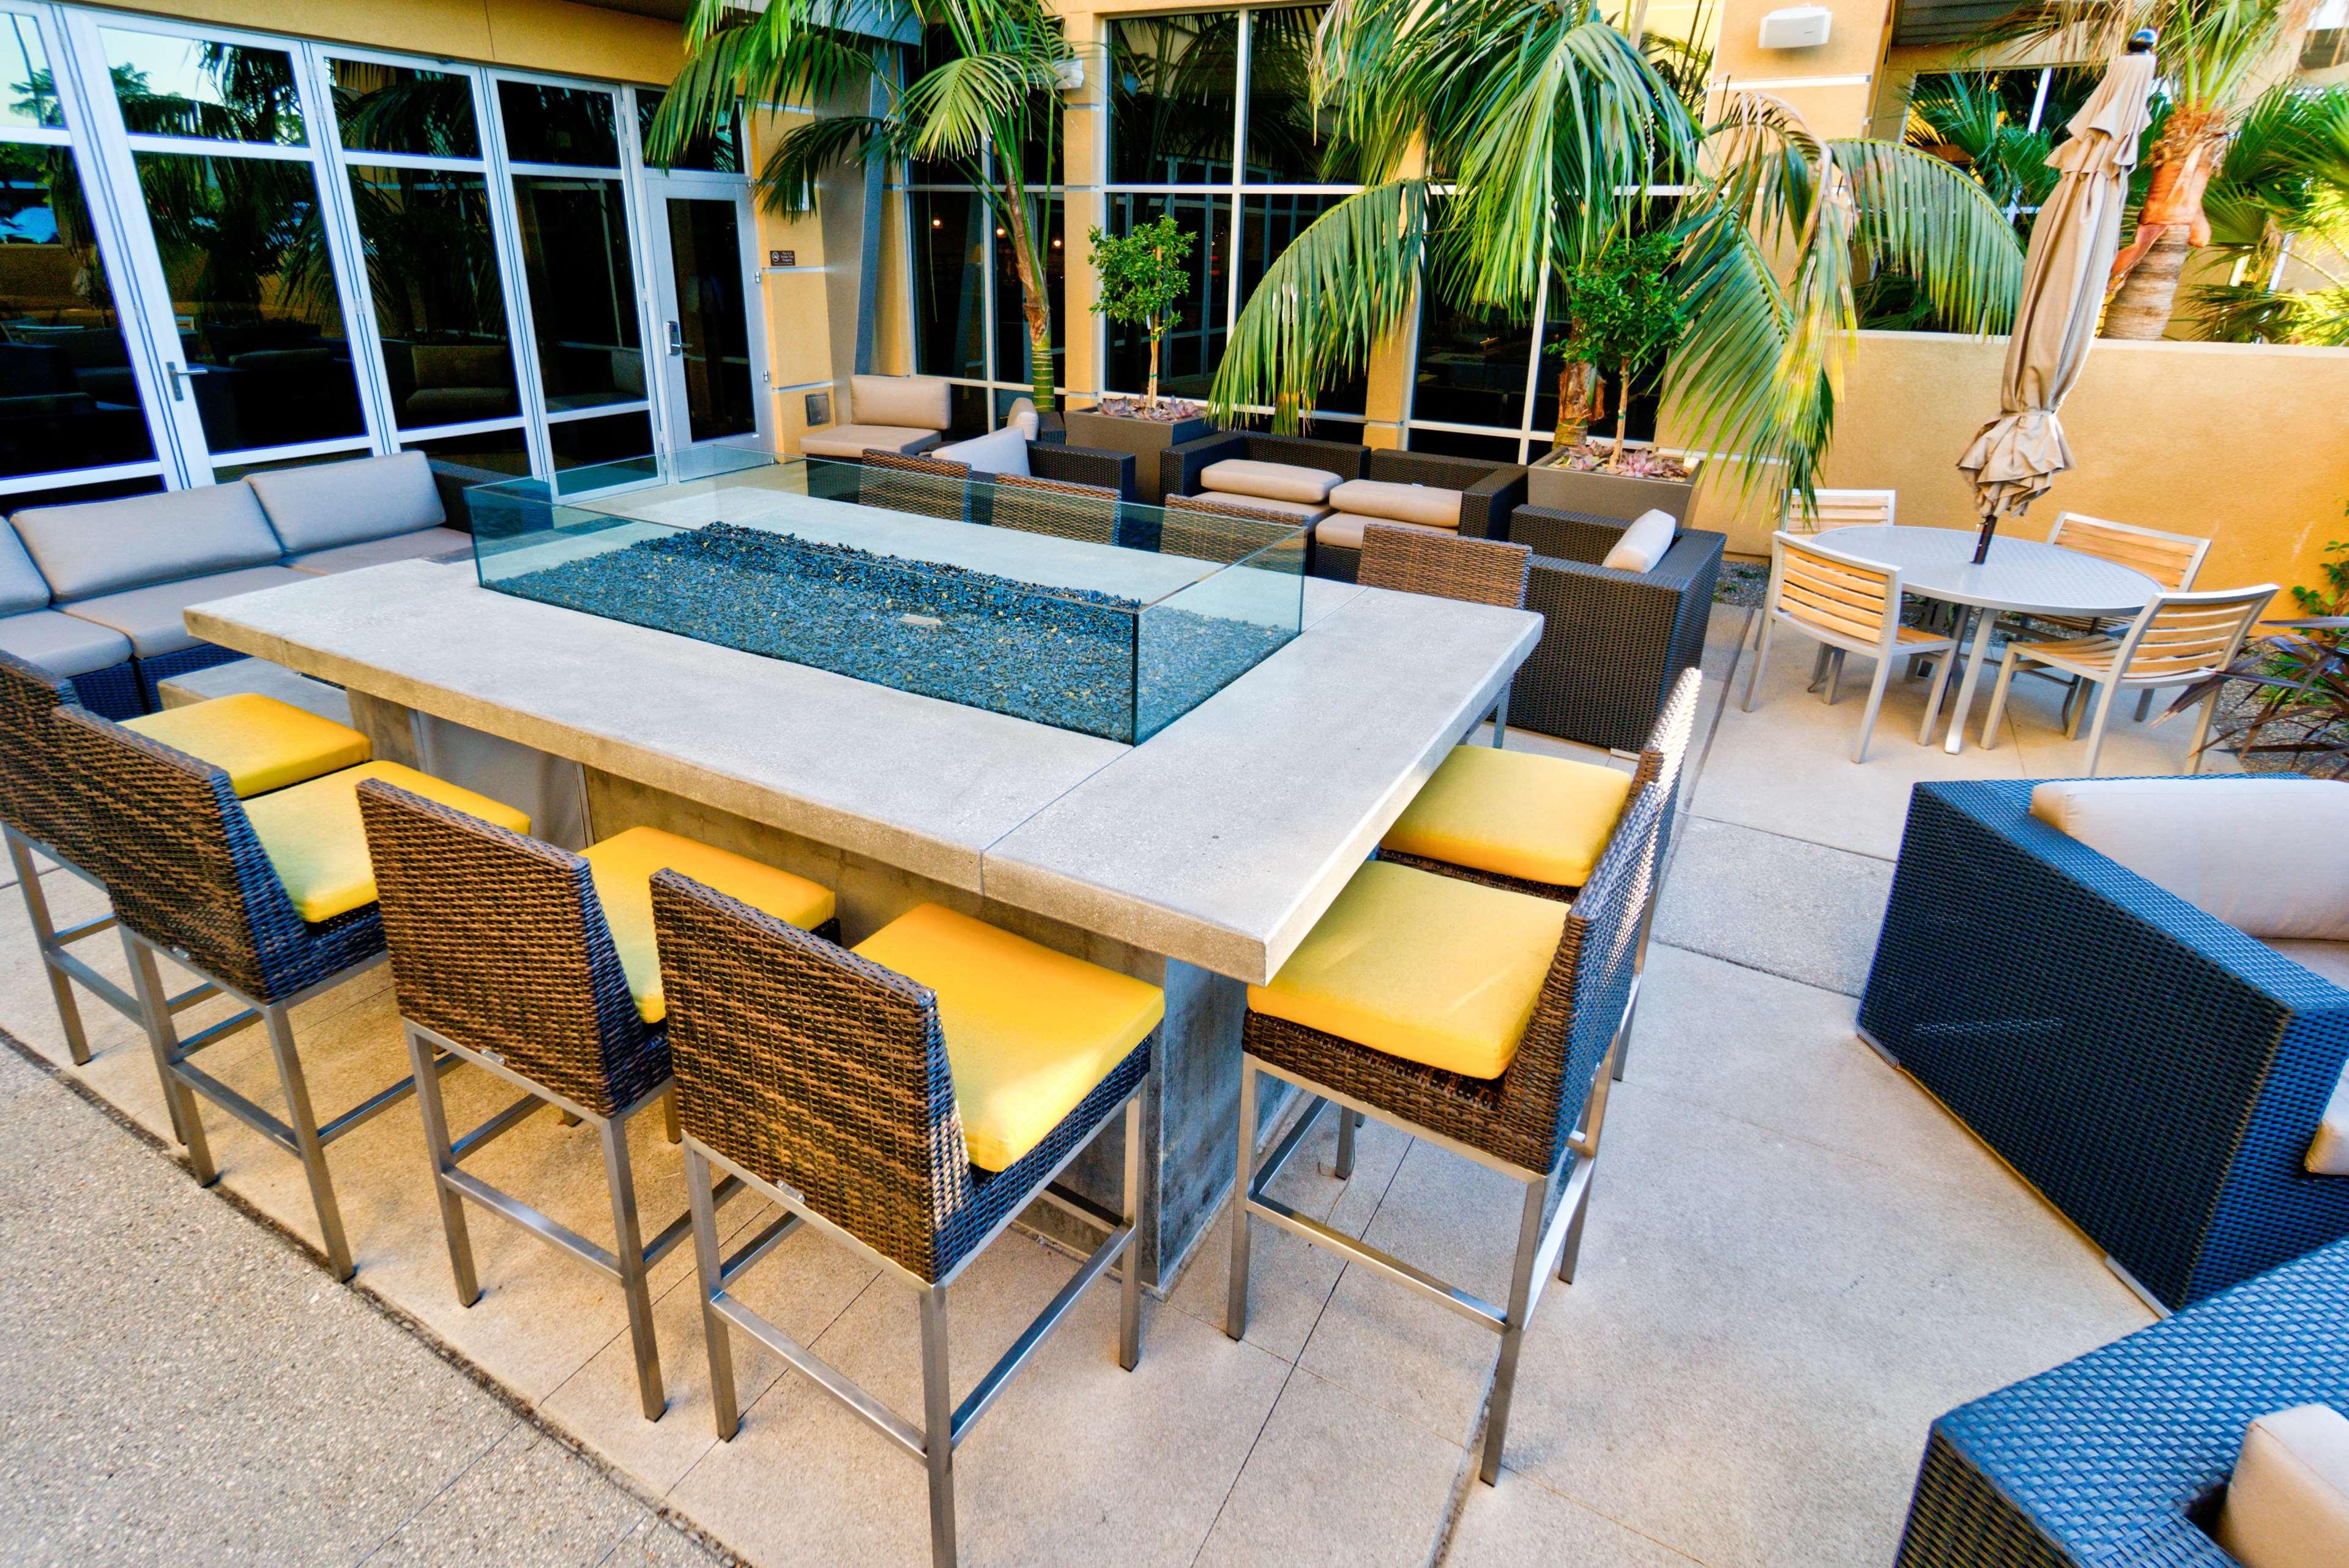 Hilton Garden Inn Santa Barbara/Goleta image 9